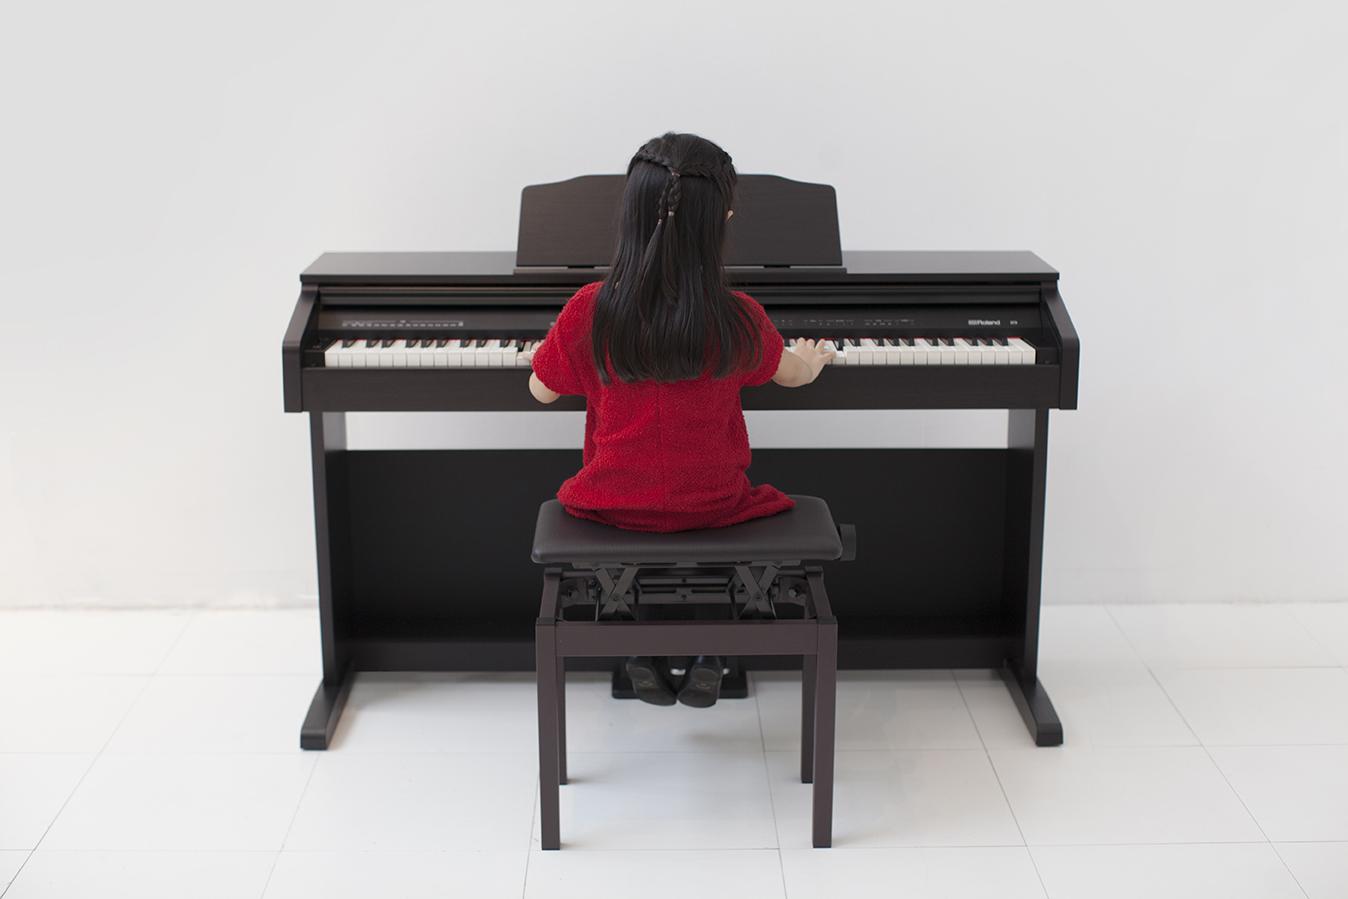 top-nhung-cay-dan-piano-dien-gia-re-ban-chay-nhat-nam-2021-roland-rp-30